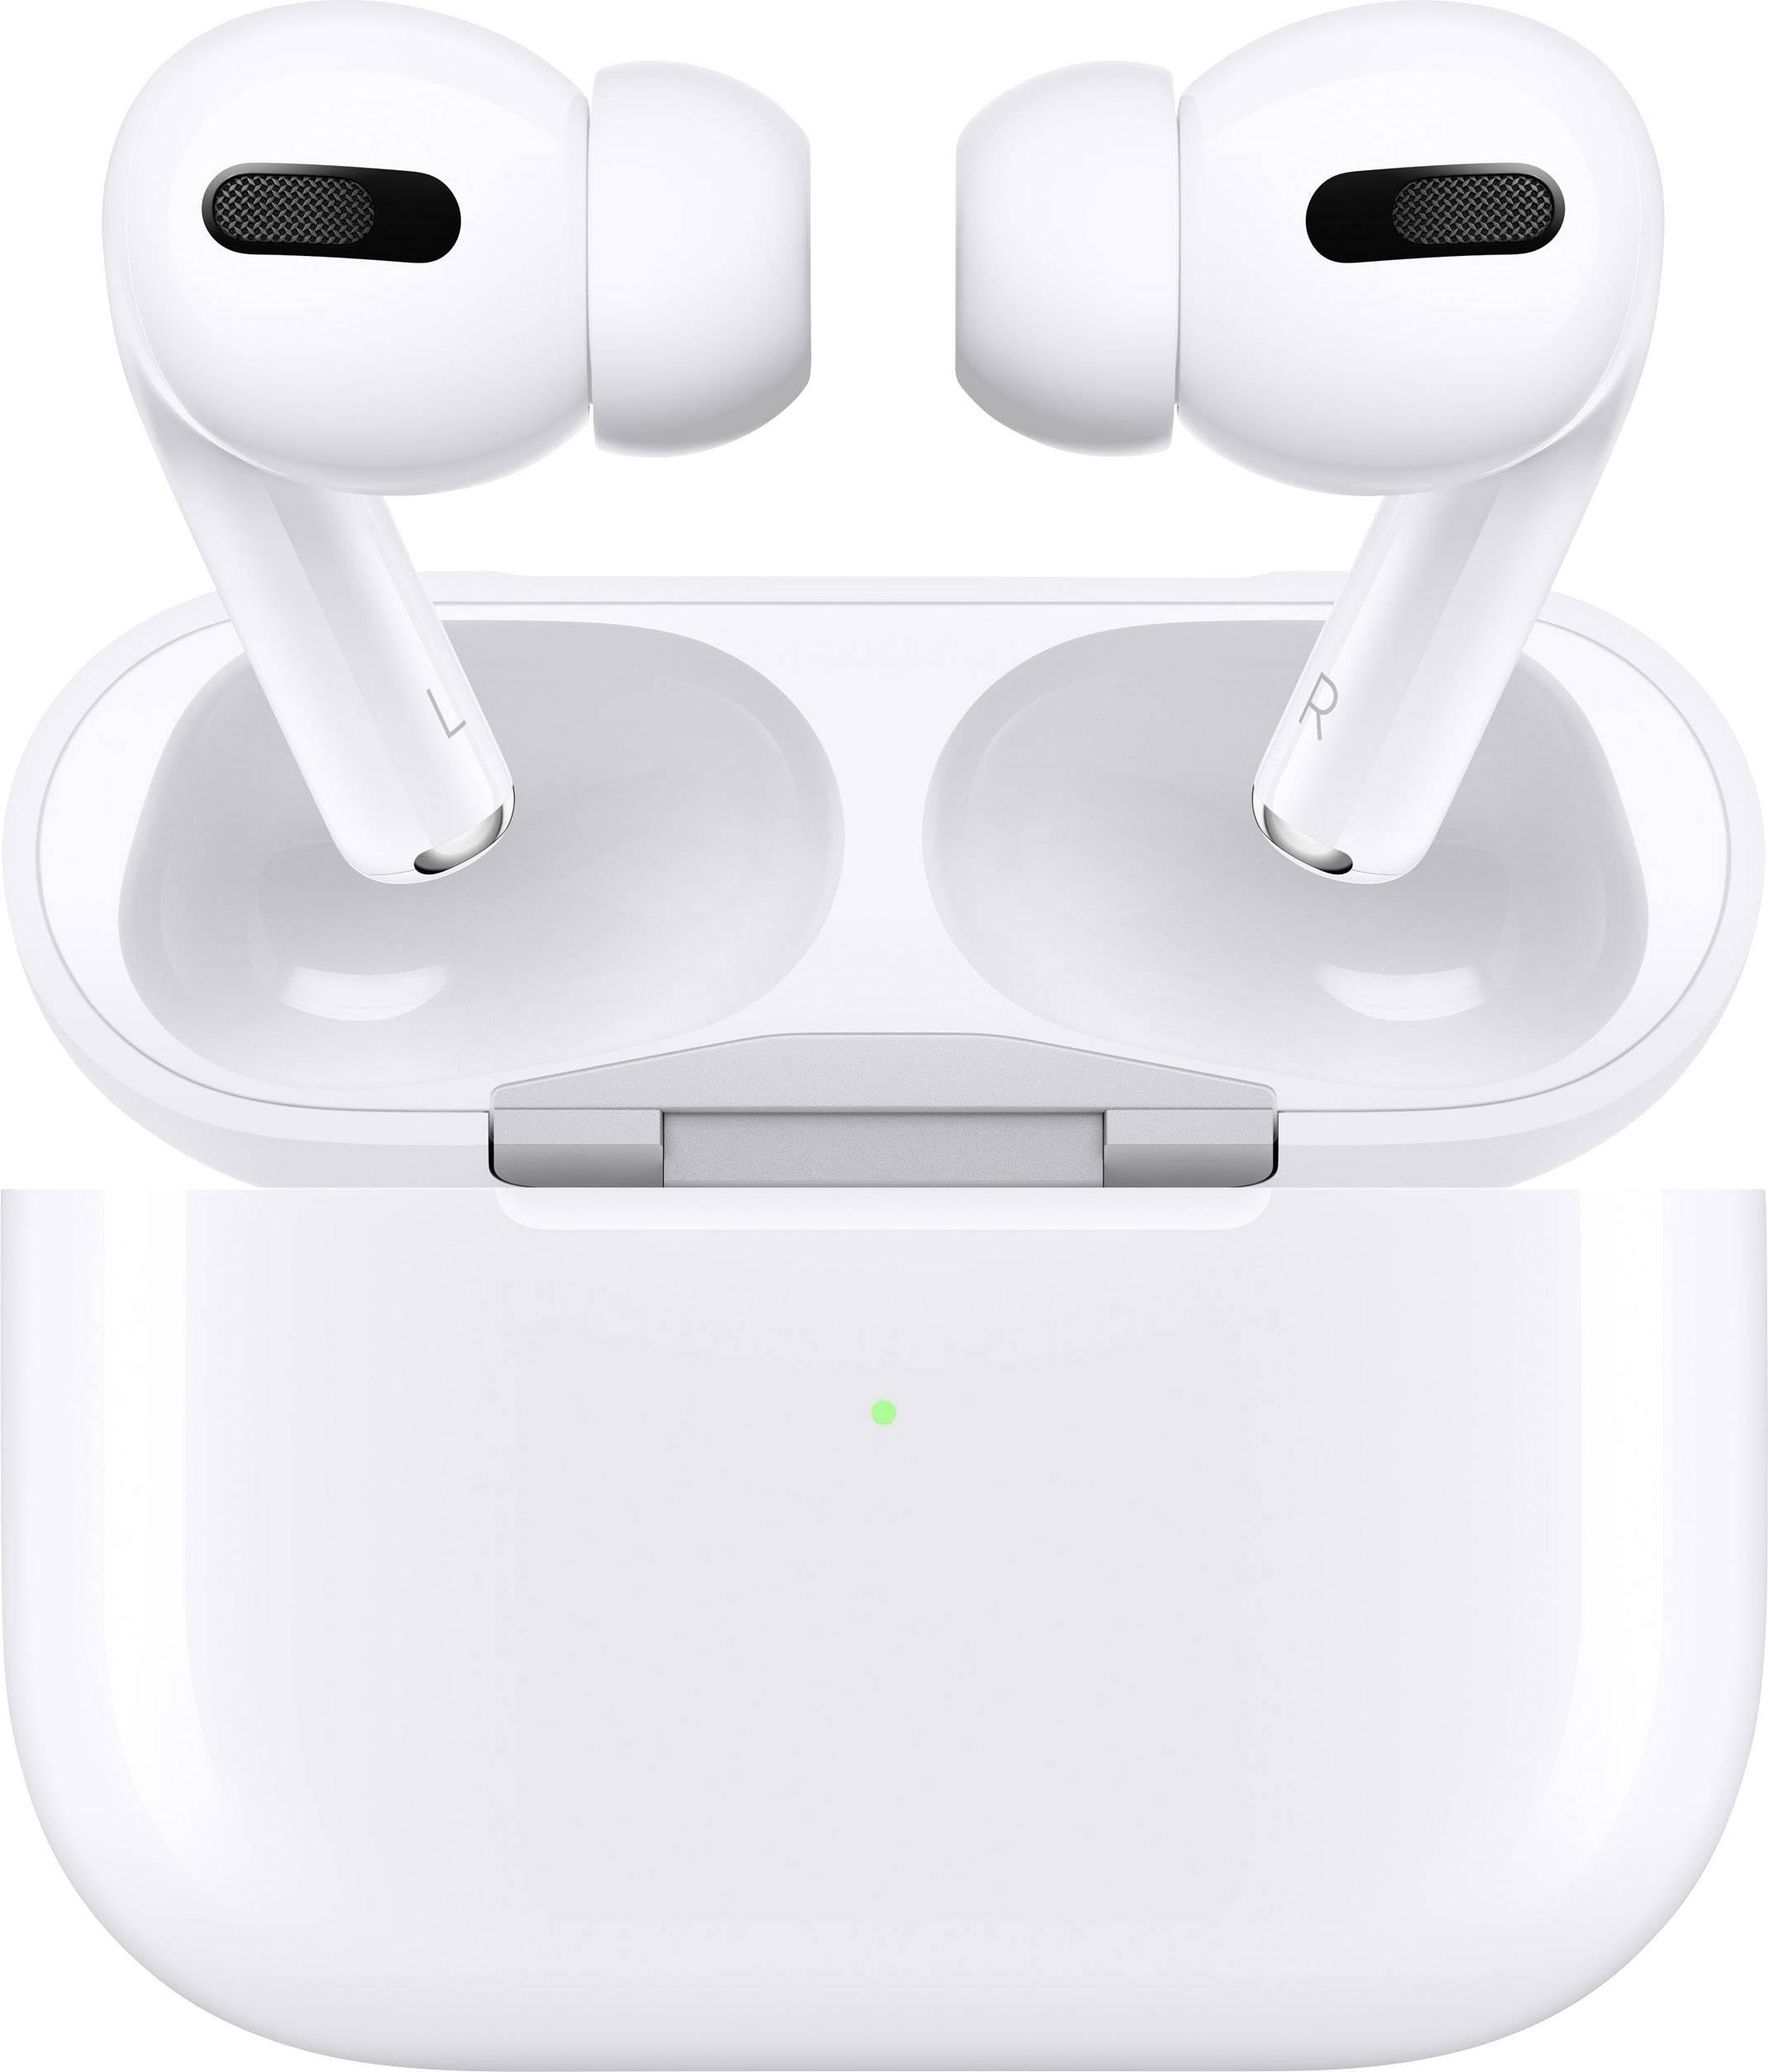 apple airpods pro mit wireless charging case bluetooth in ear oordopjes in ear wit. Black Bedroom Furniture Sets. Home Design Ideas